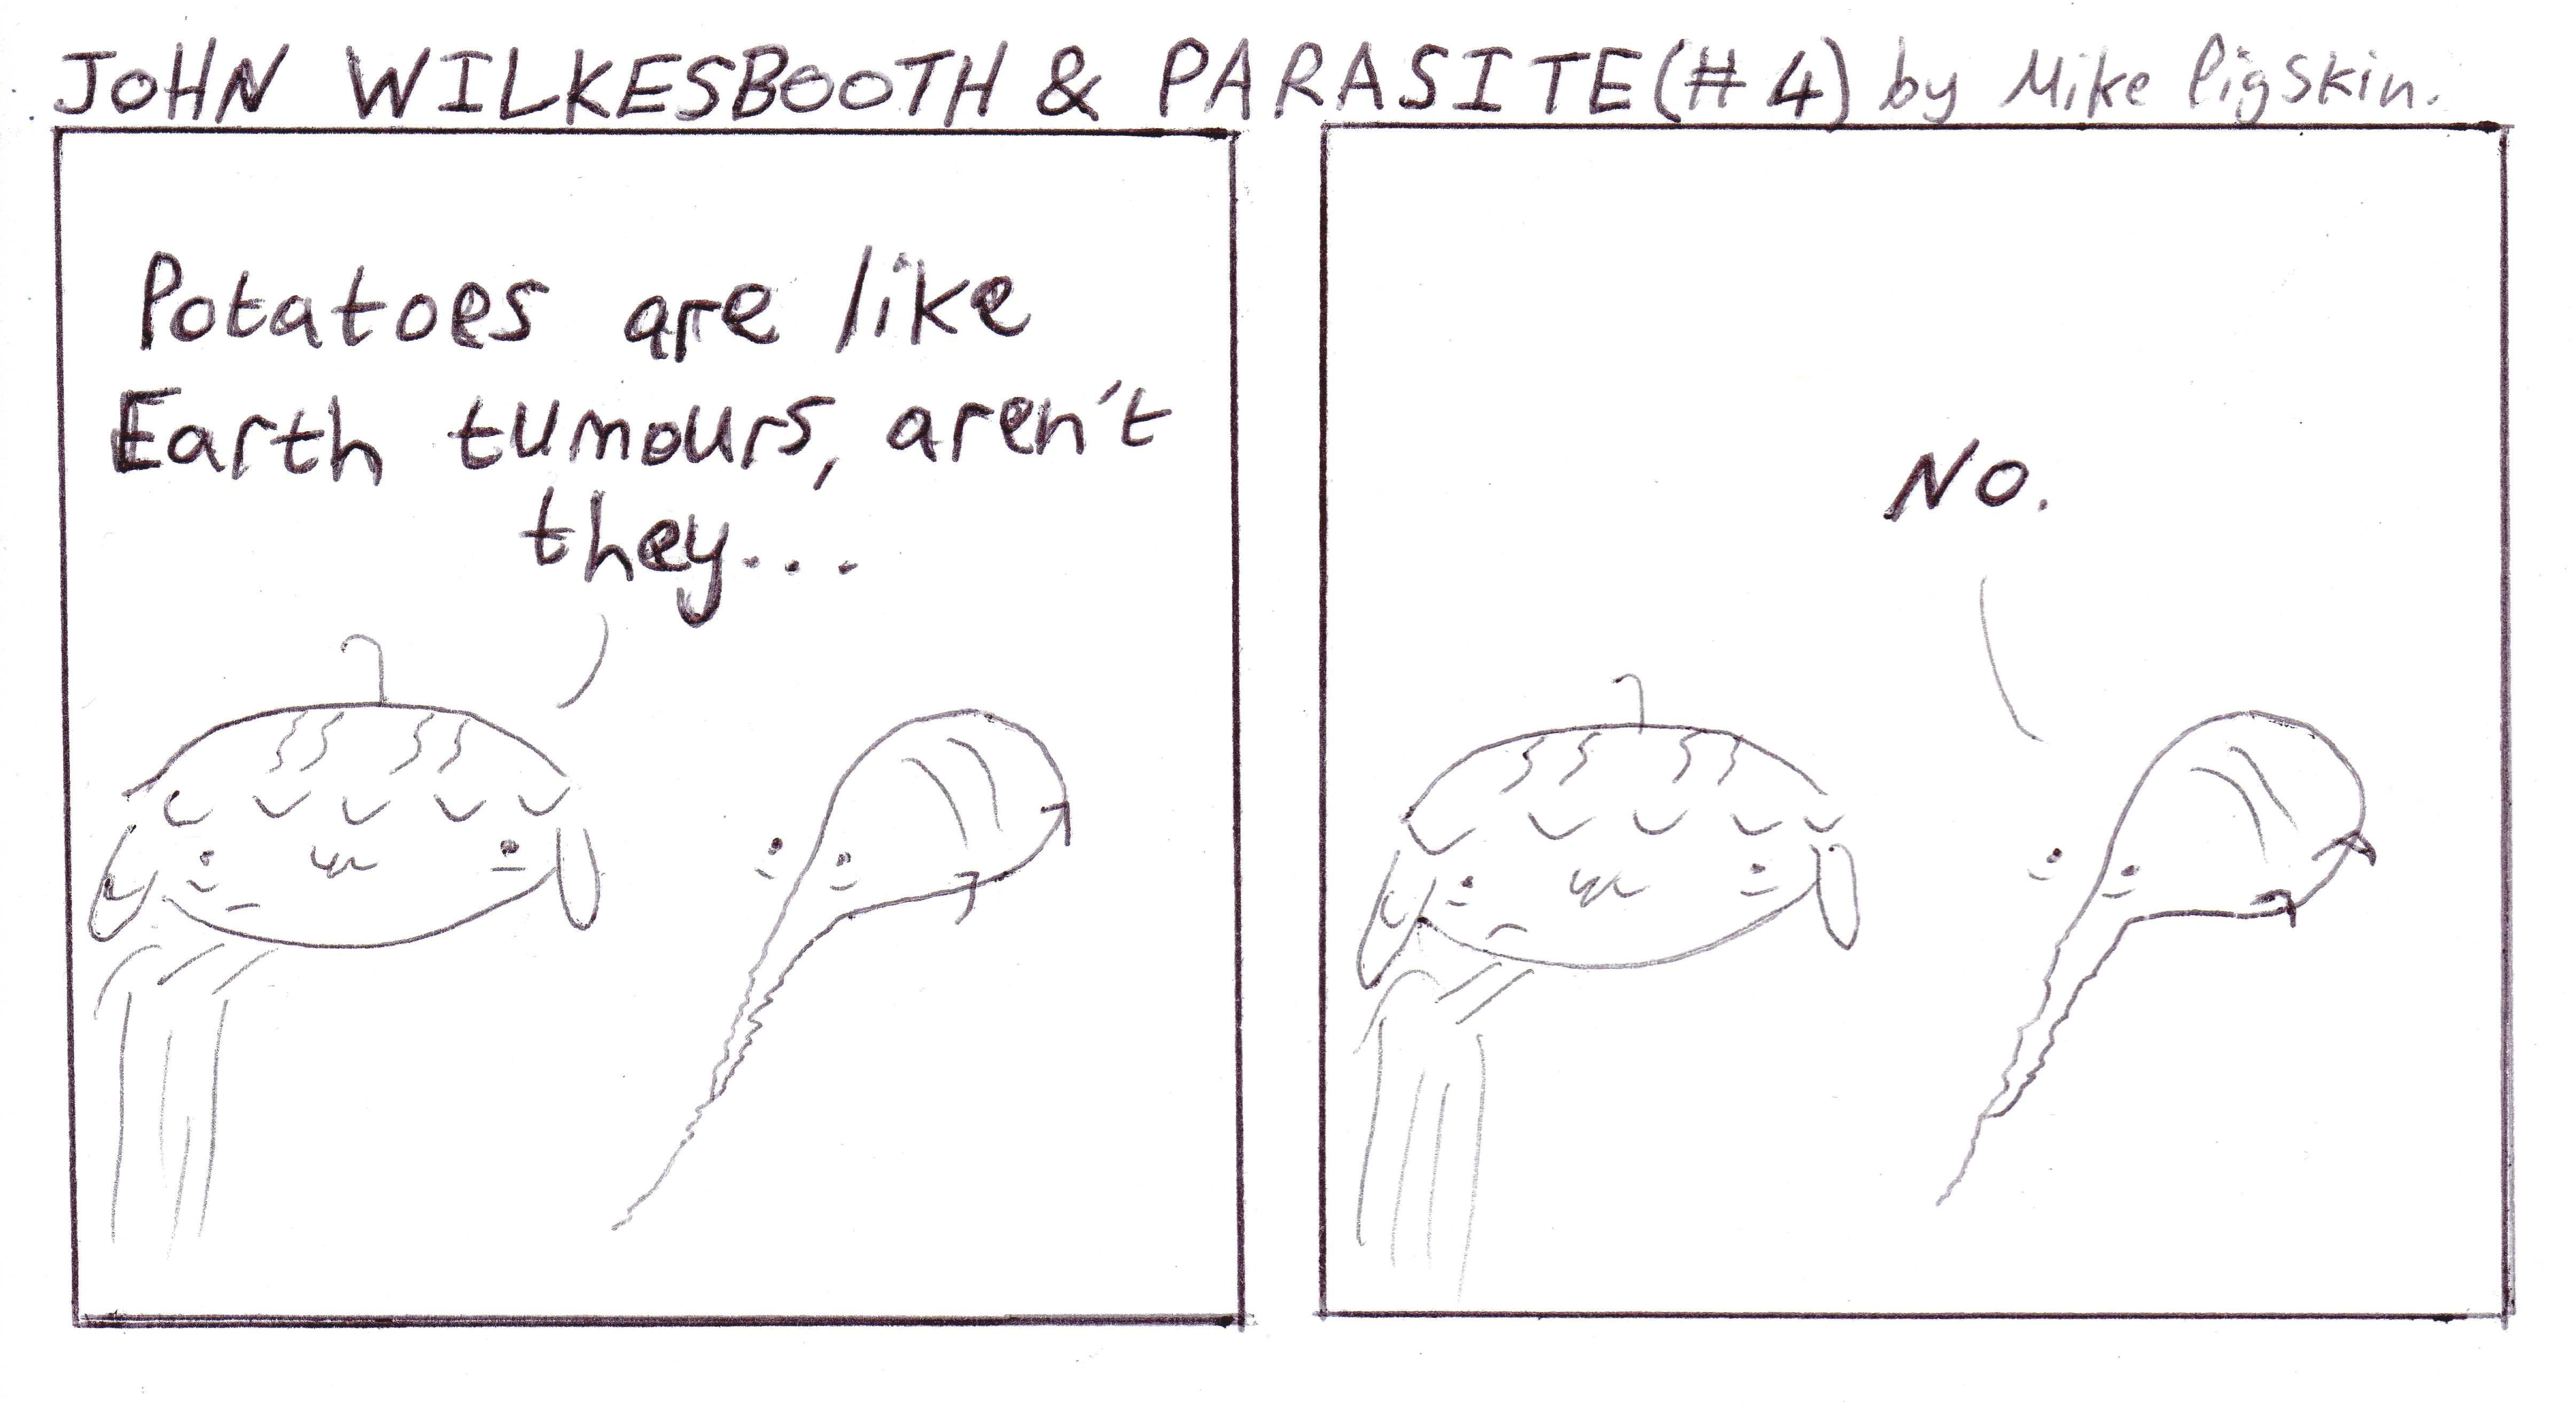 John Wilkesbooth & Parasite #4